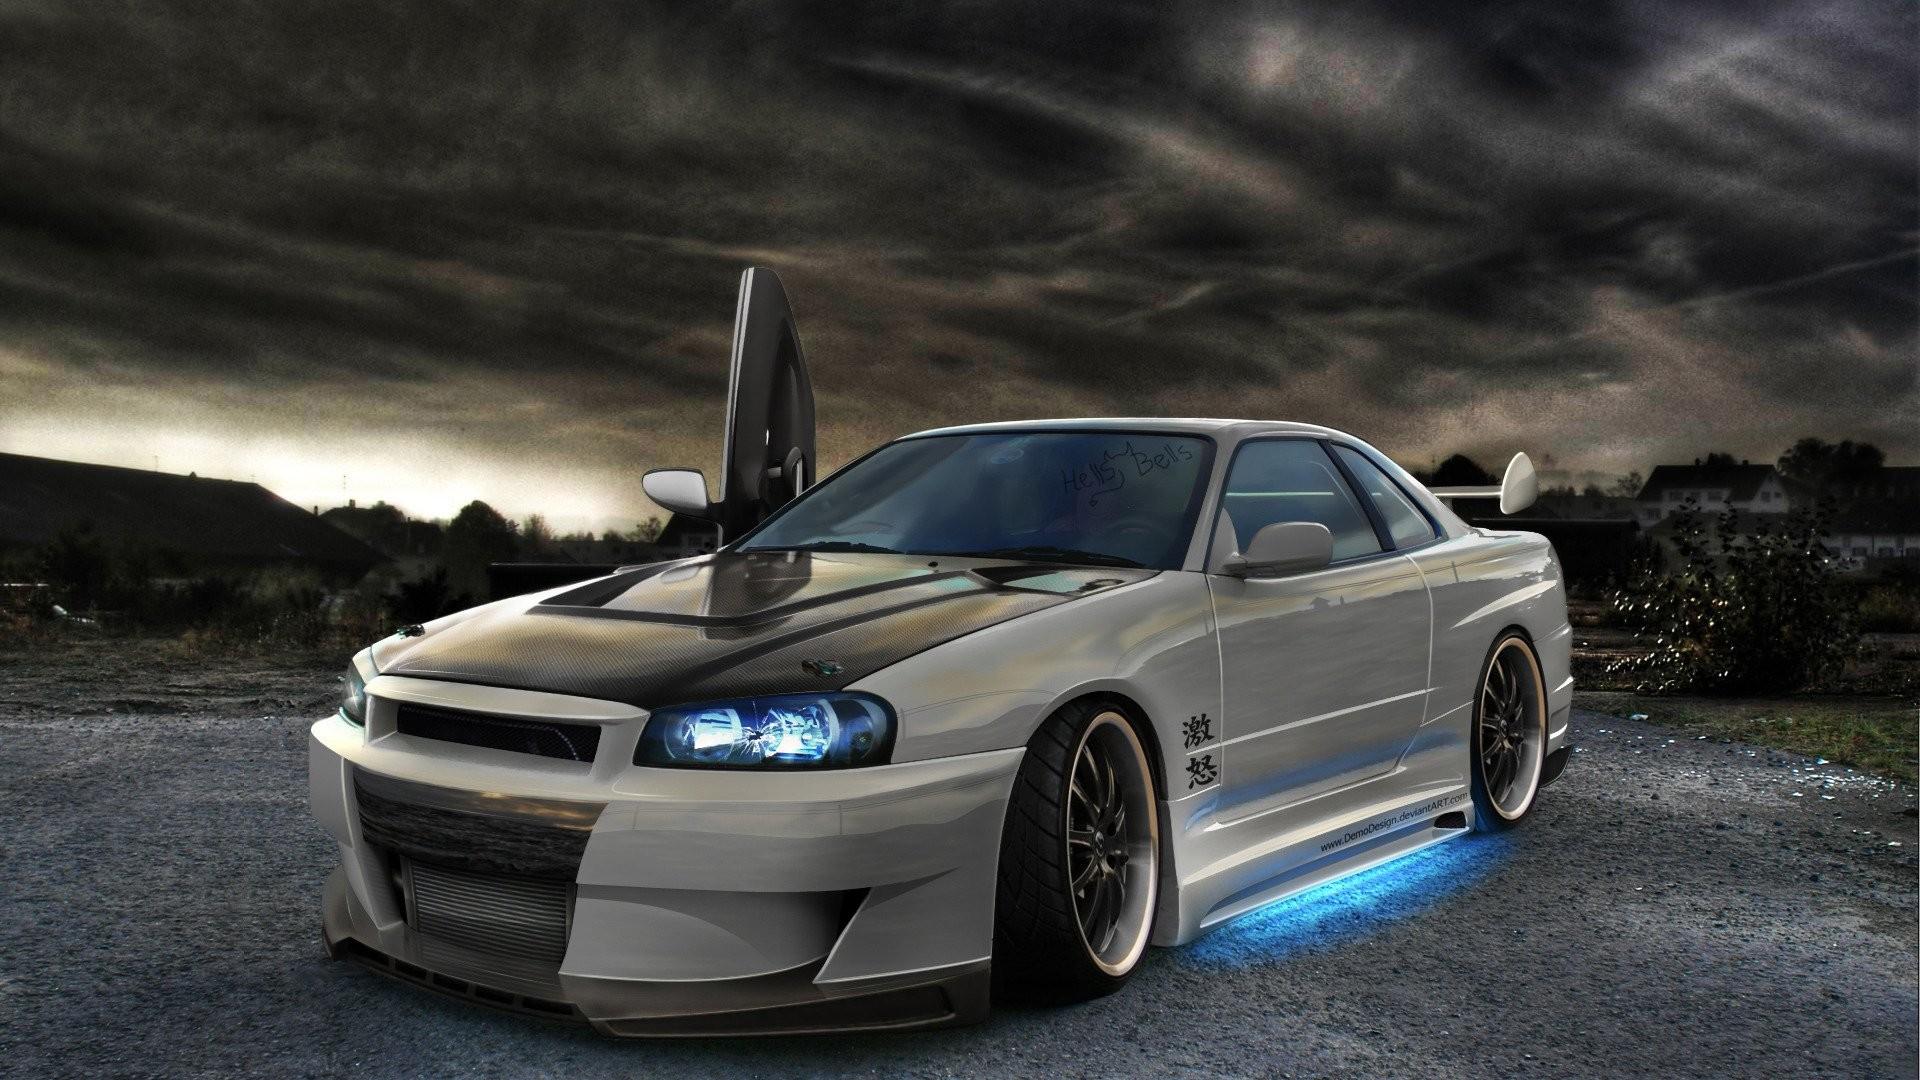 Nissan Skyline Wallpaper HD (73+ images)